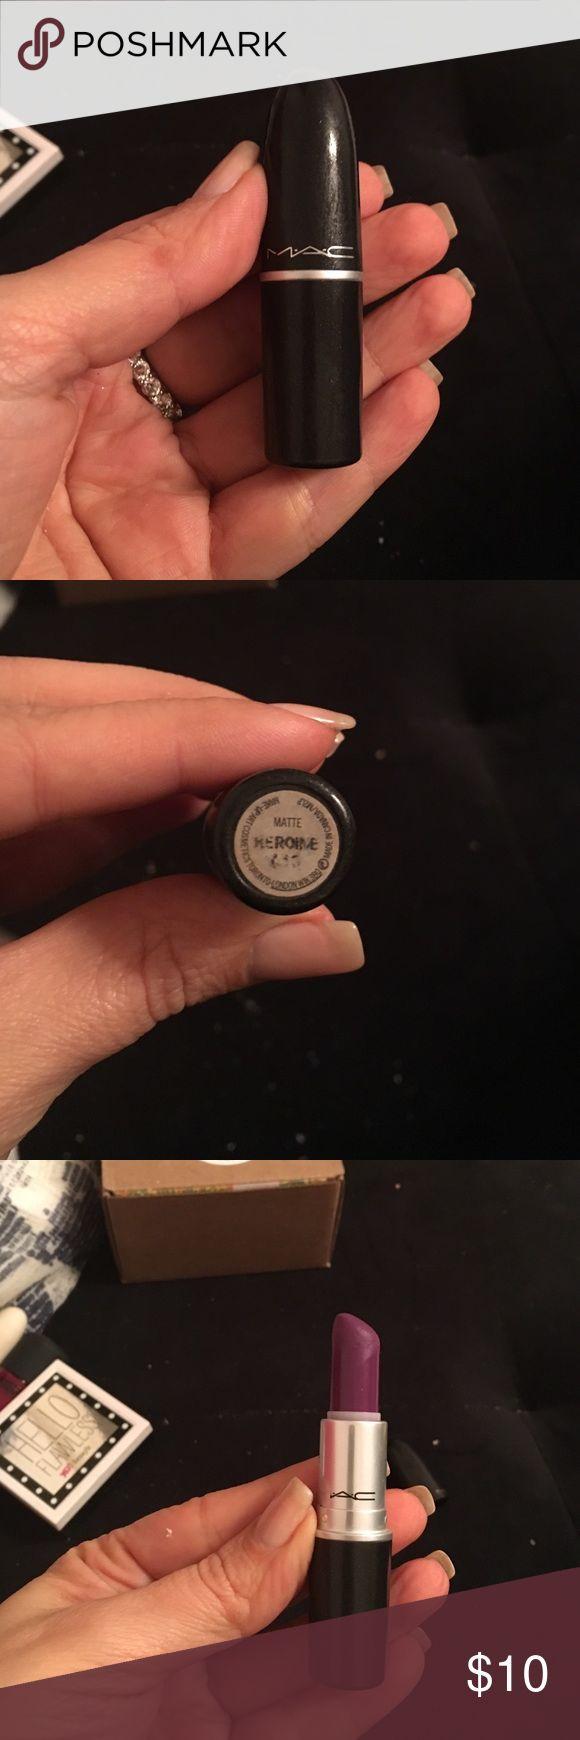 Mac lipstick Used Mac lipstick in color matte heroine MAC Cosmetics Makeup Lipstick